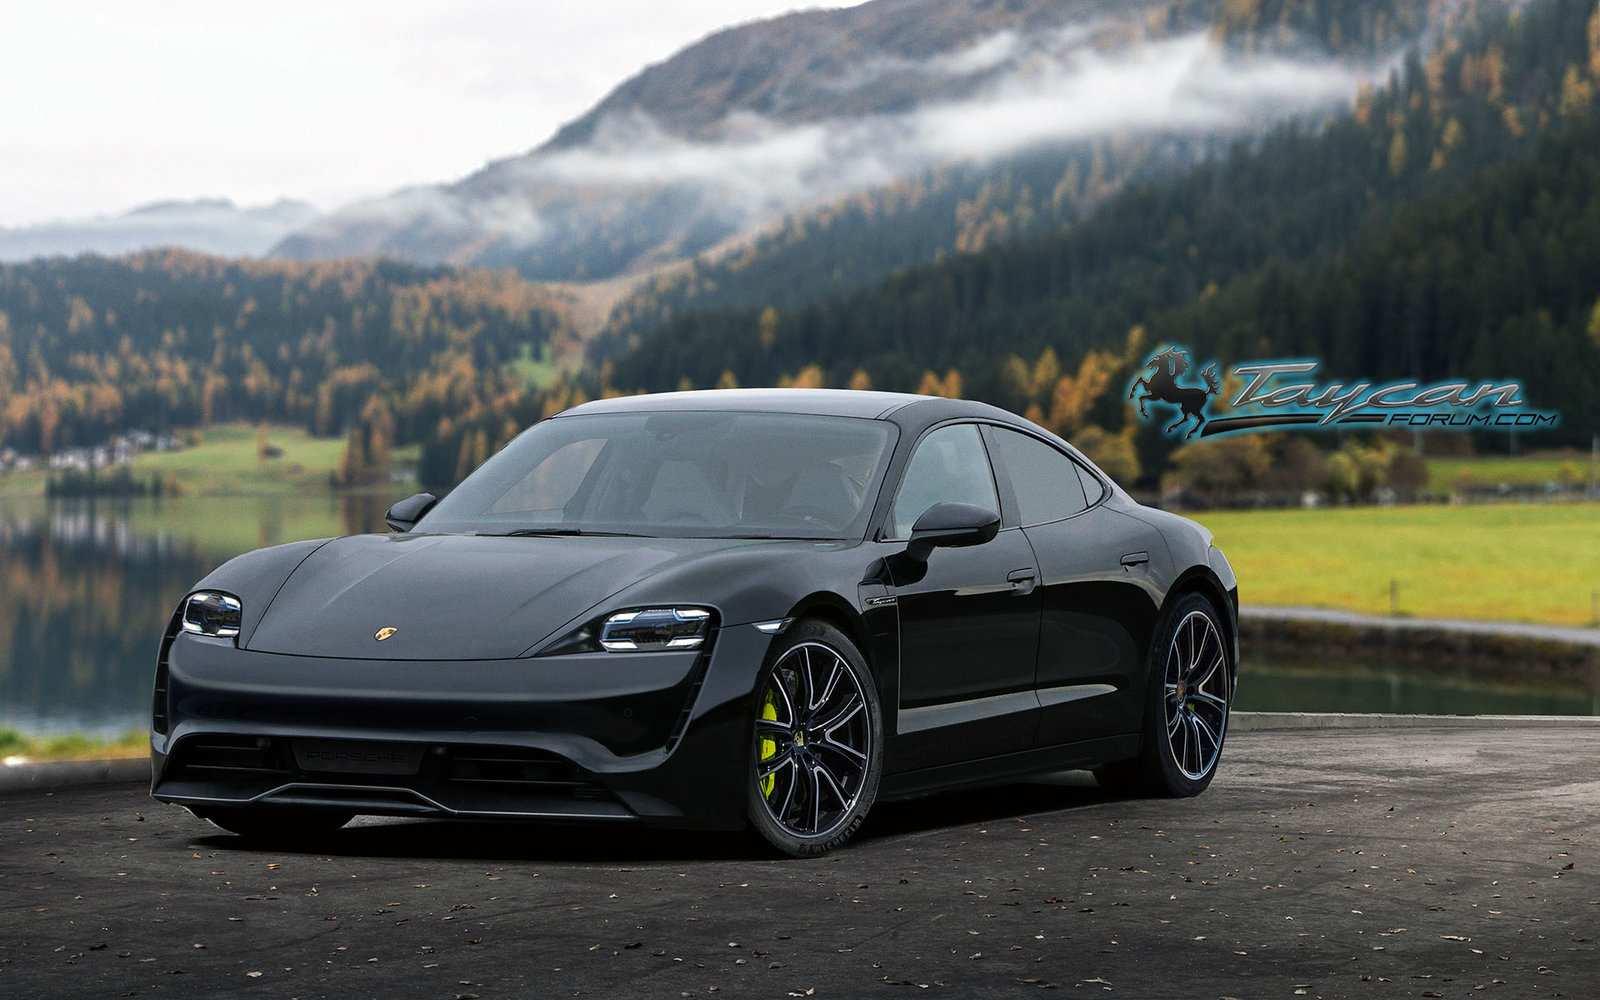 97 Great 2020 Porsche Taycan Wallpaper for 2020 Porsche Taycan 1600x1000